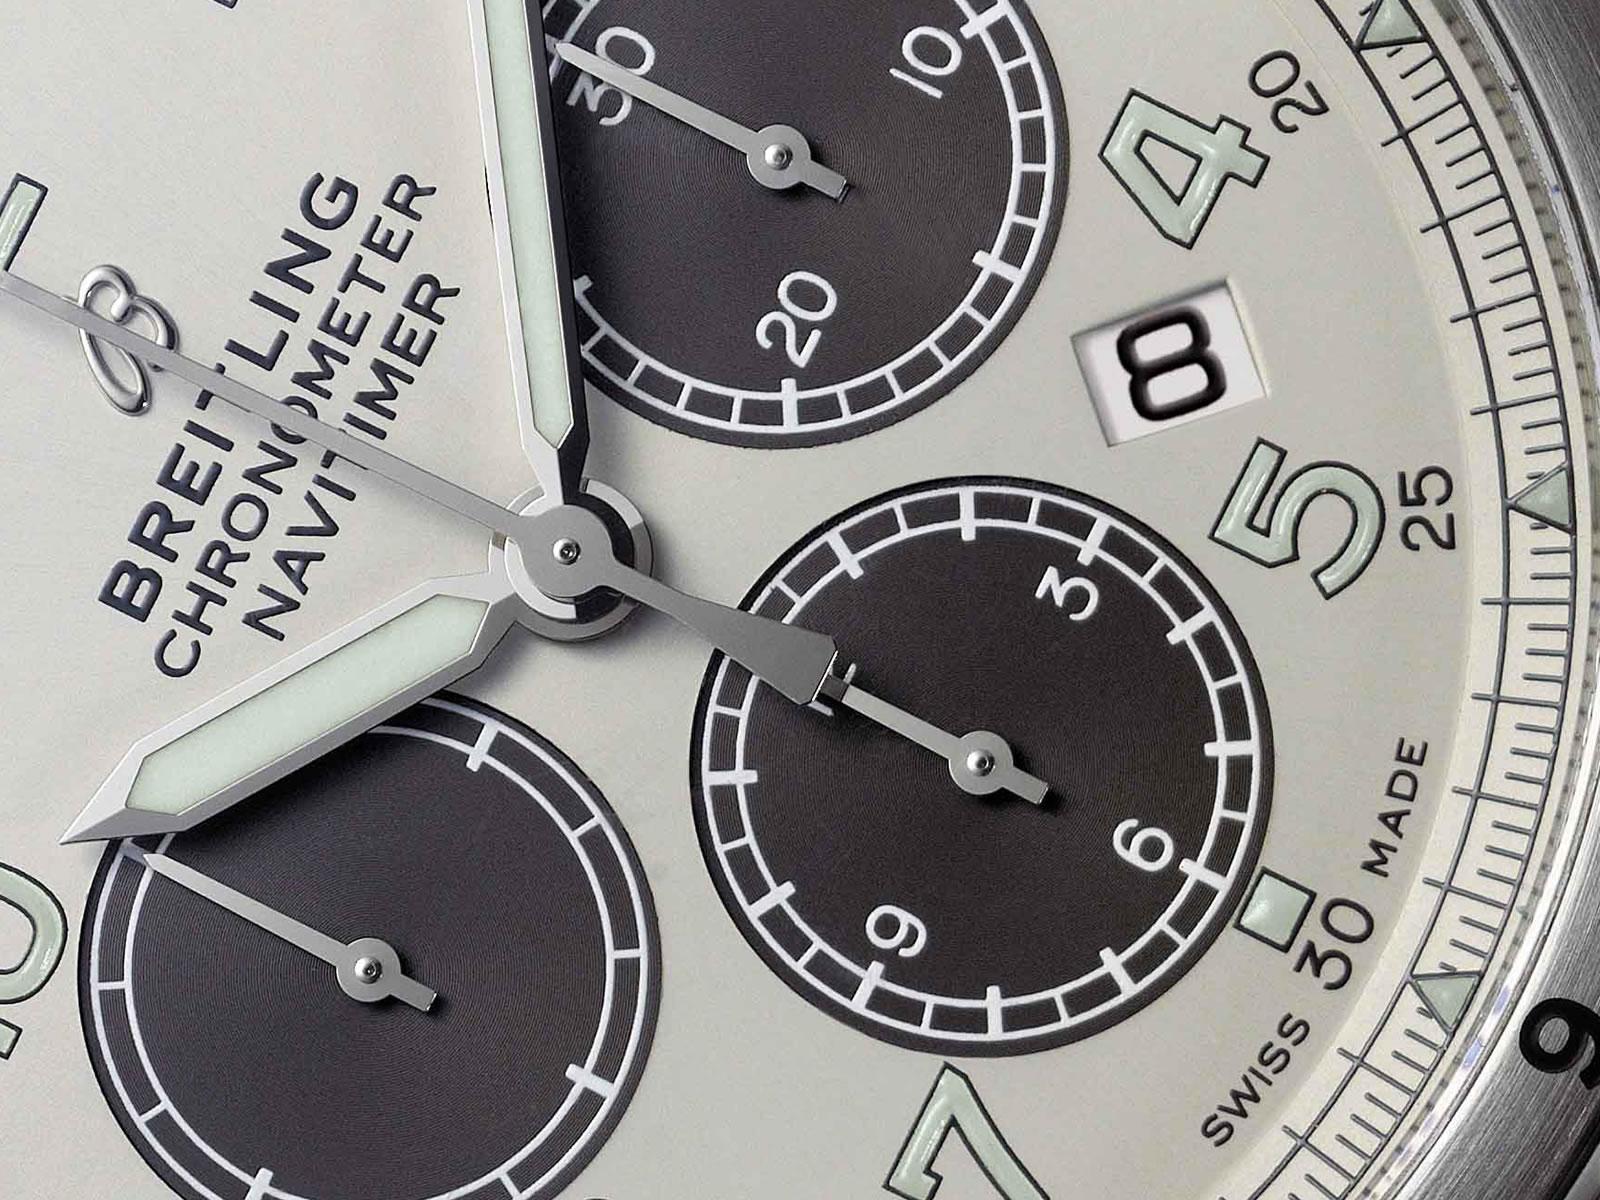 ab01171a-g839-breitling-navitimer-aviator-8-b01-the-chronograph-43-6.jpg